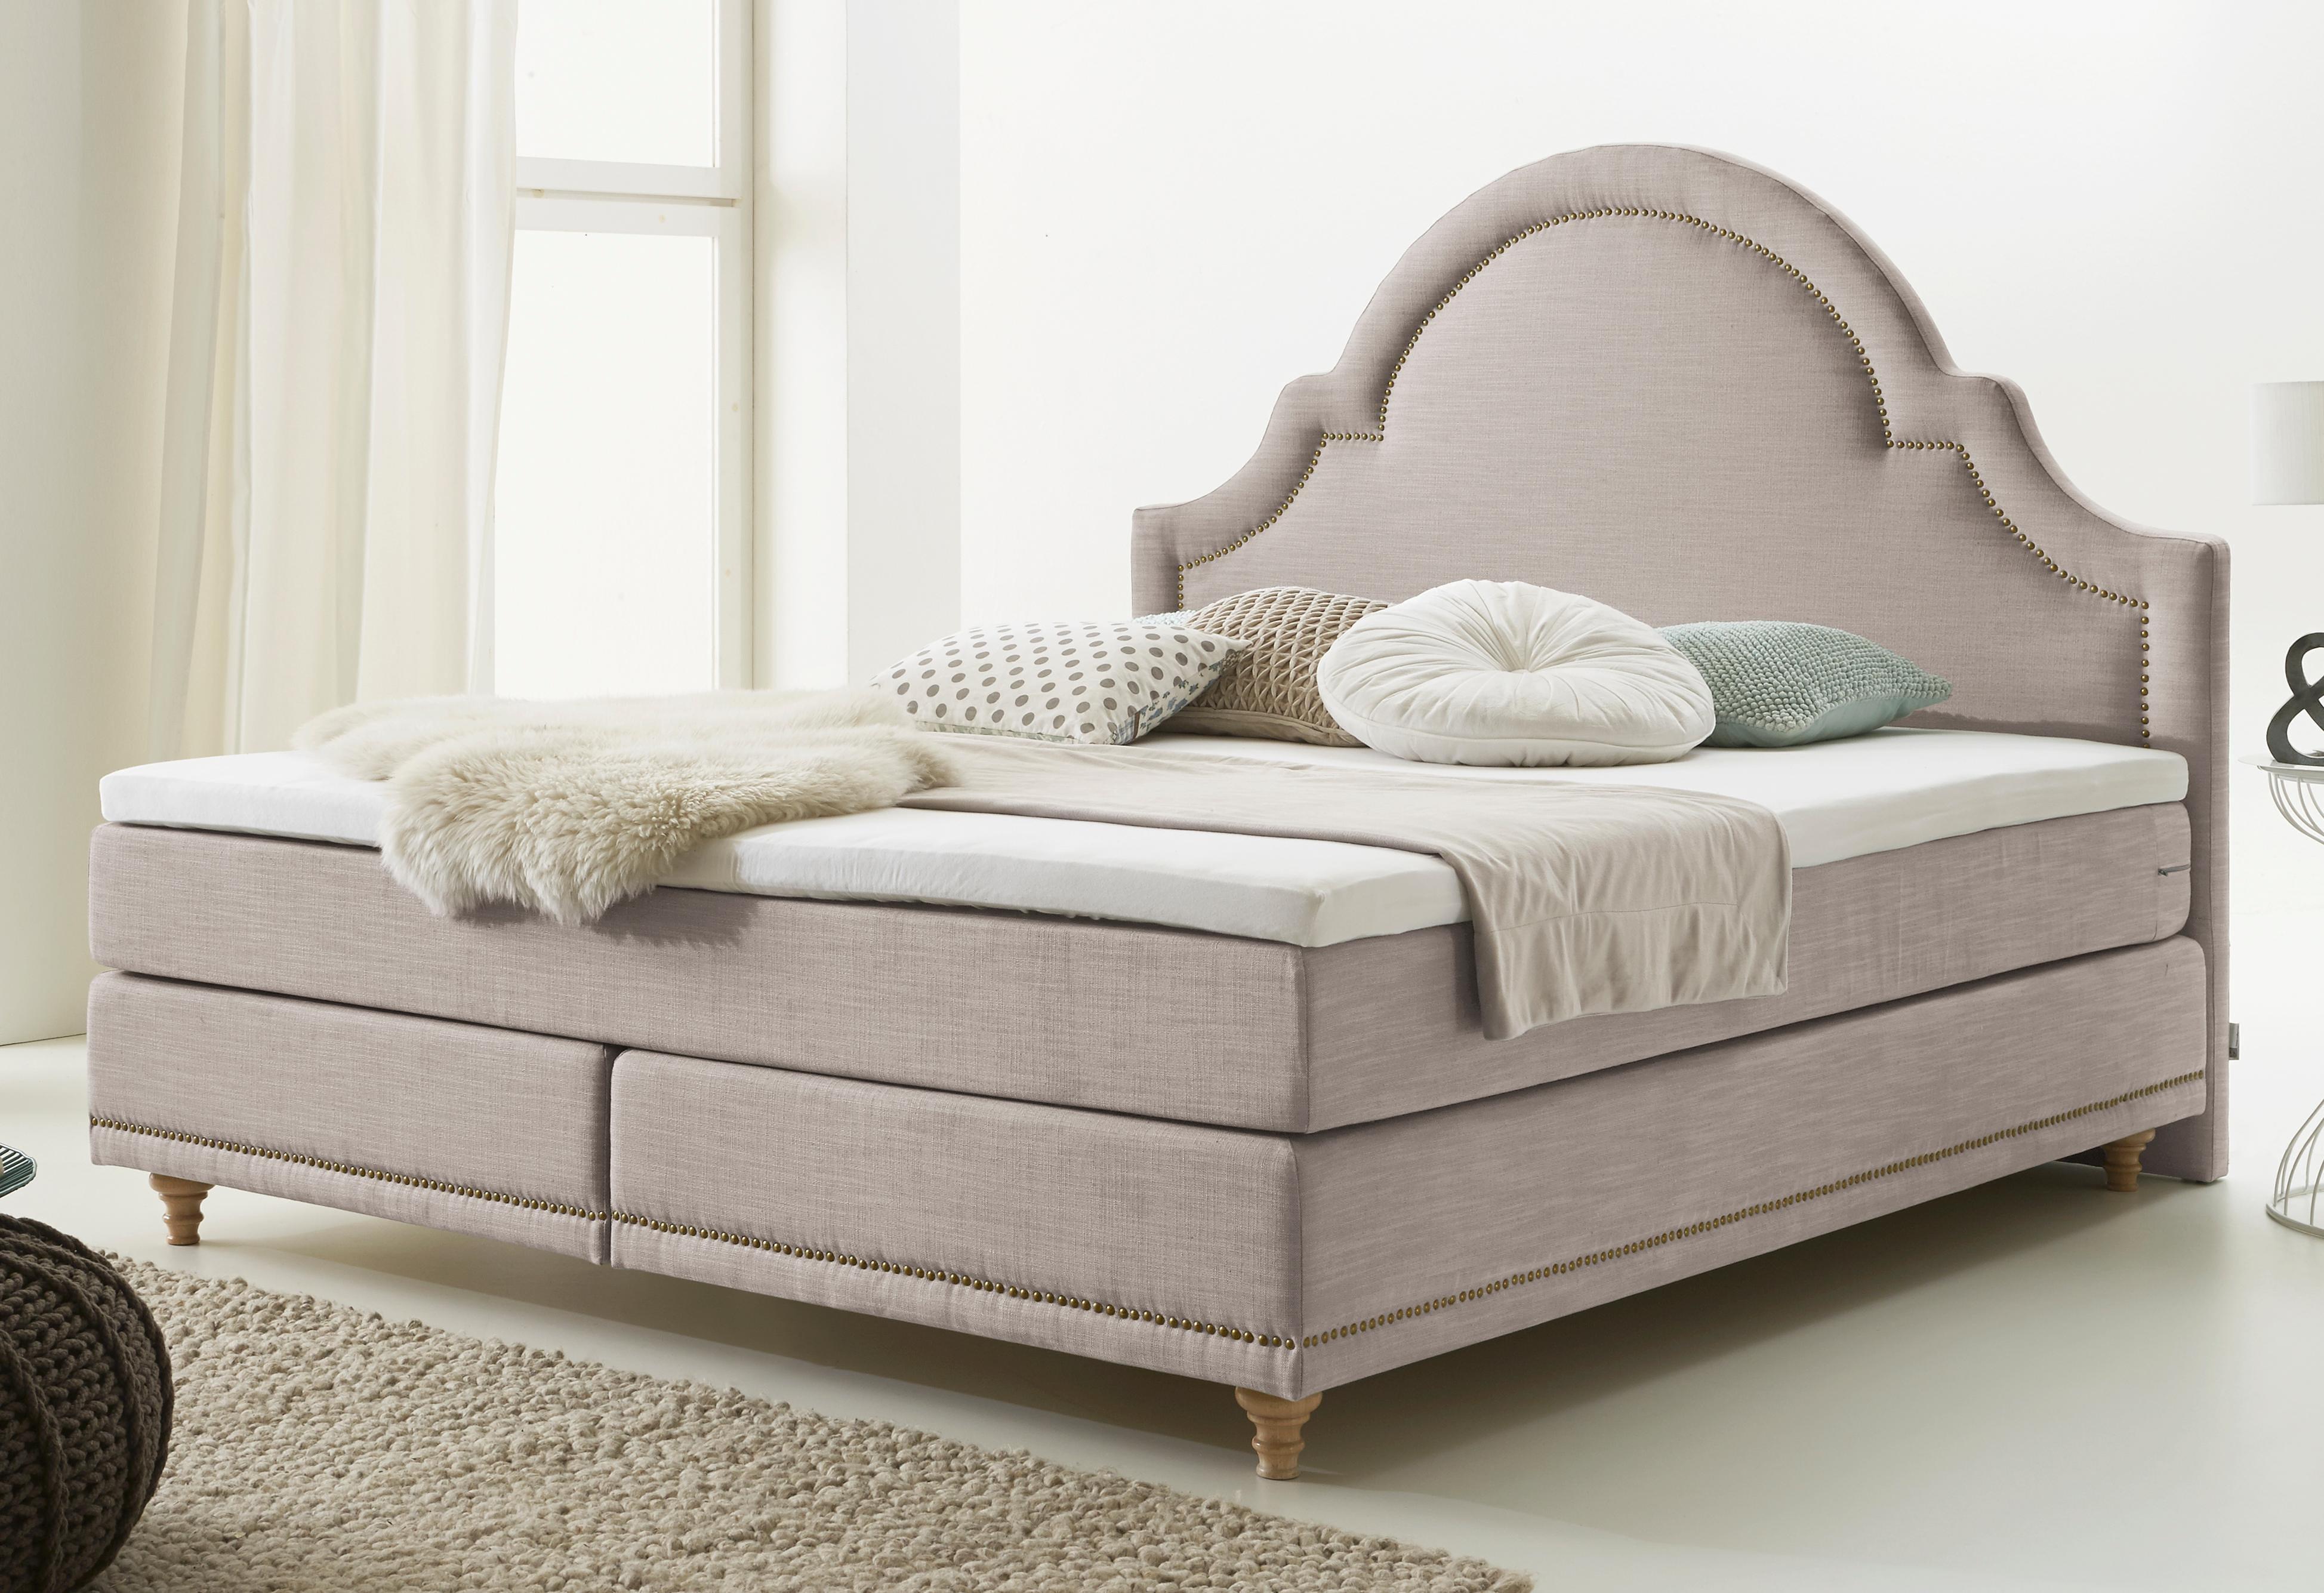 mint stoff boxspringbetten online kaufen m bel suchmaschine. Black Bedroom Furniture Sets. Home Design Ideas